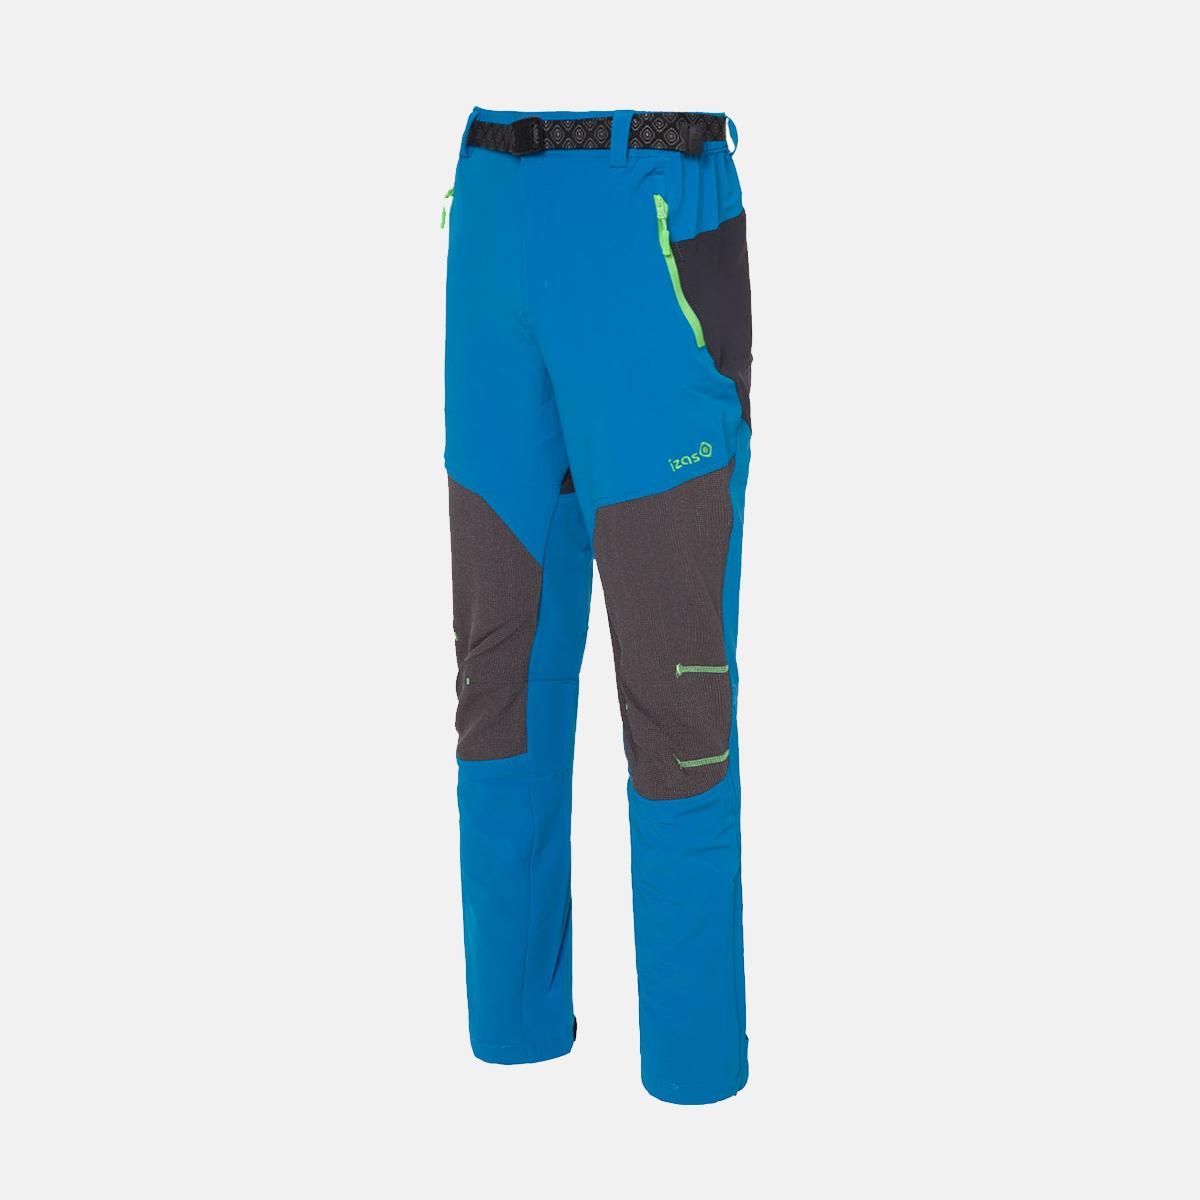 MAN'S ALETCH STRETCH PANT BLUE